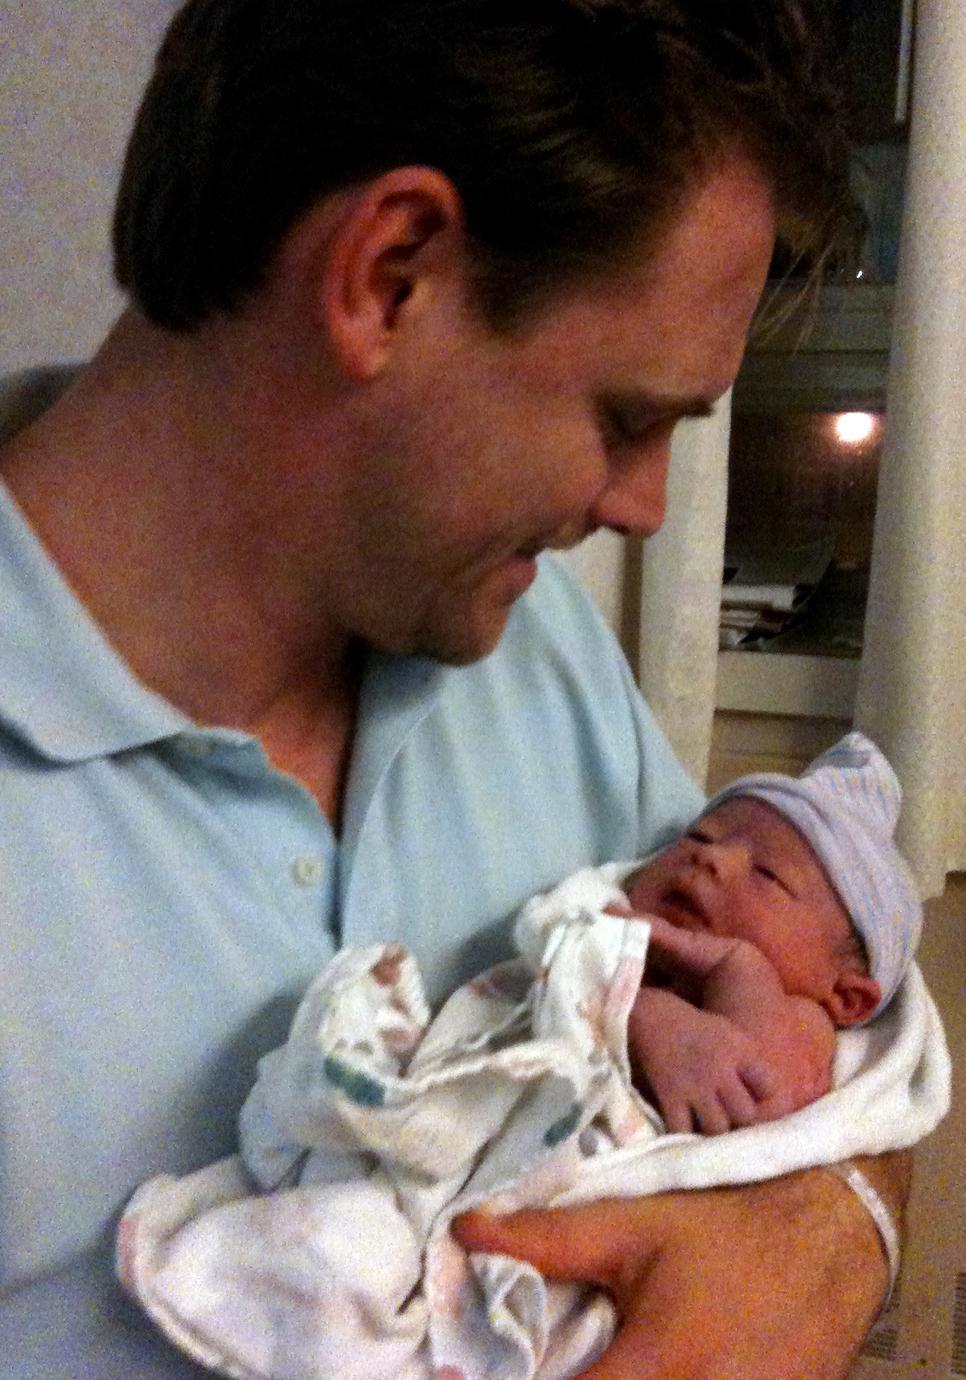 Kristian Aspelin cradles his newborn son, Johan.